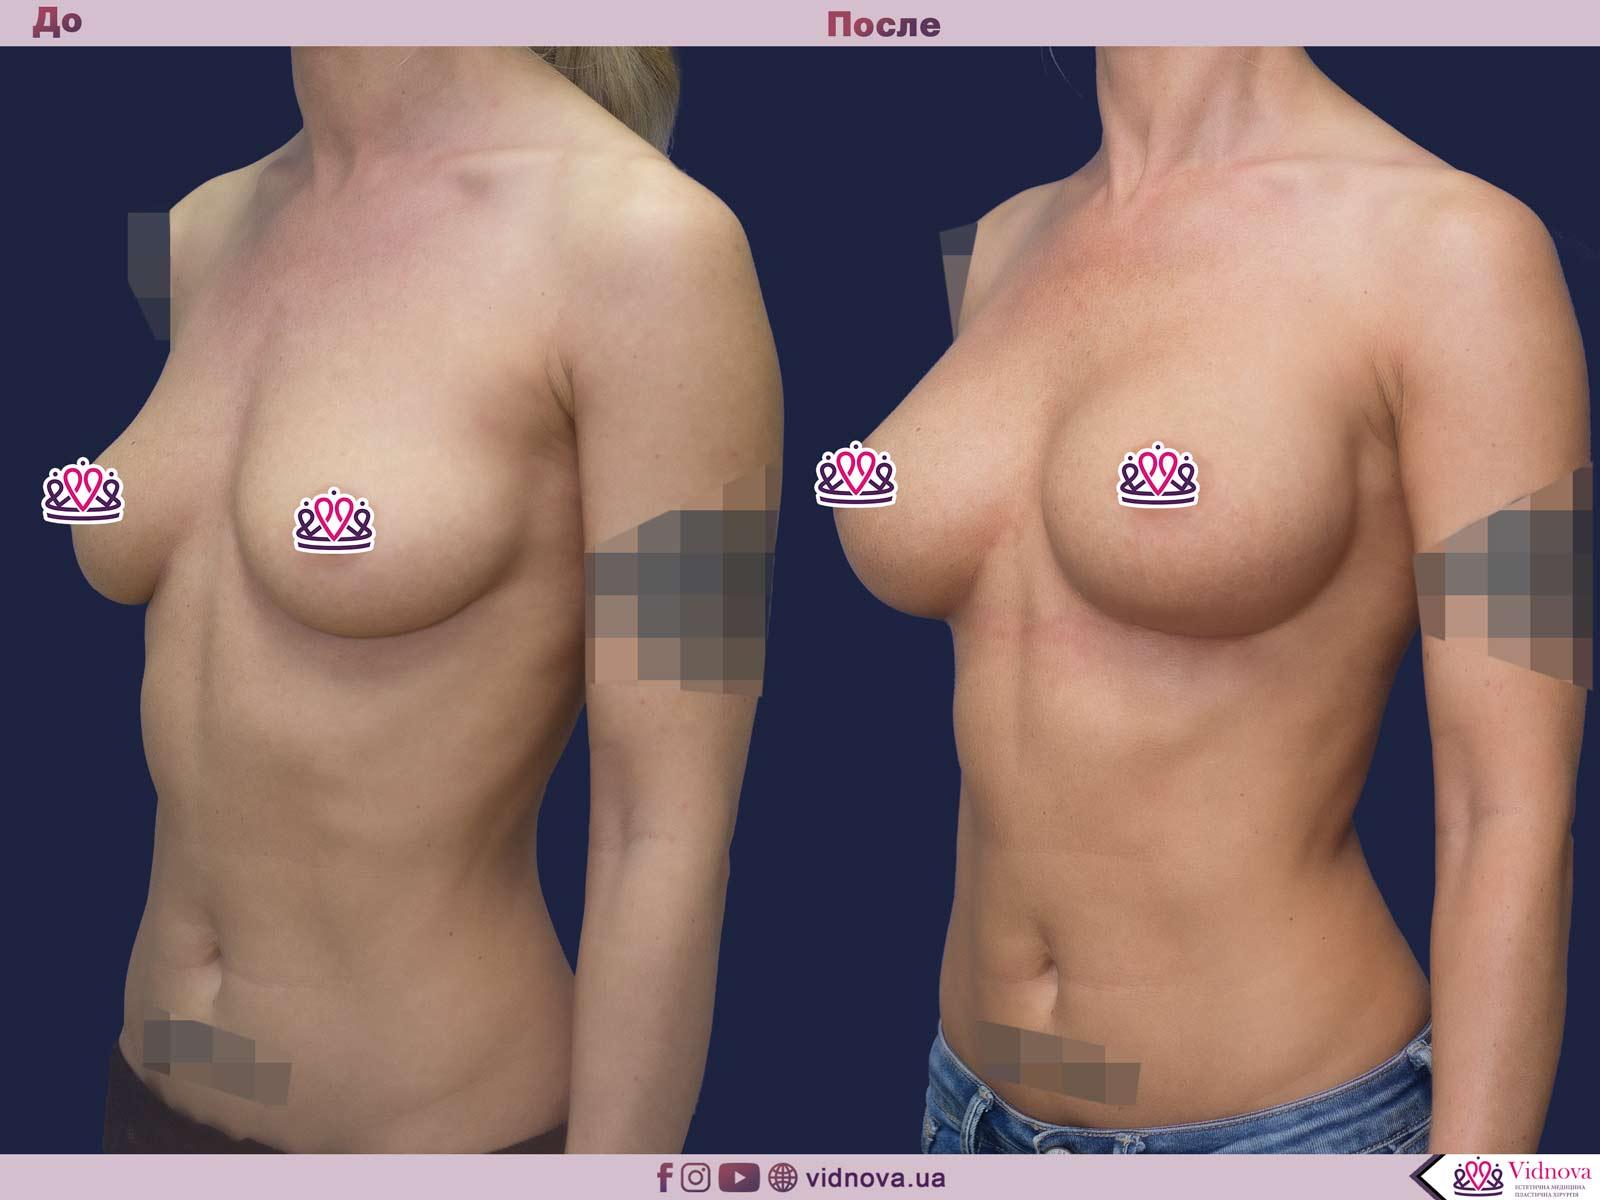 Увеличение груди: Фото ДО и ПОСЛЕ - Пример №57-2 - Клиника Vidnova